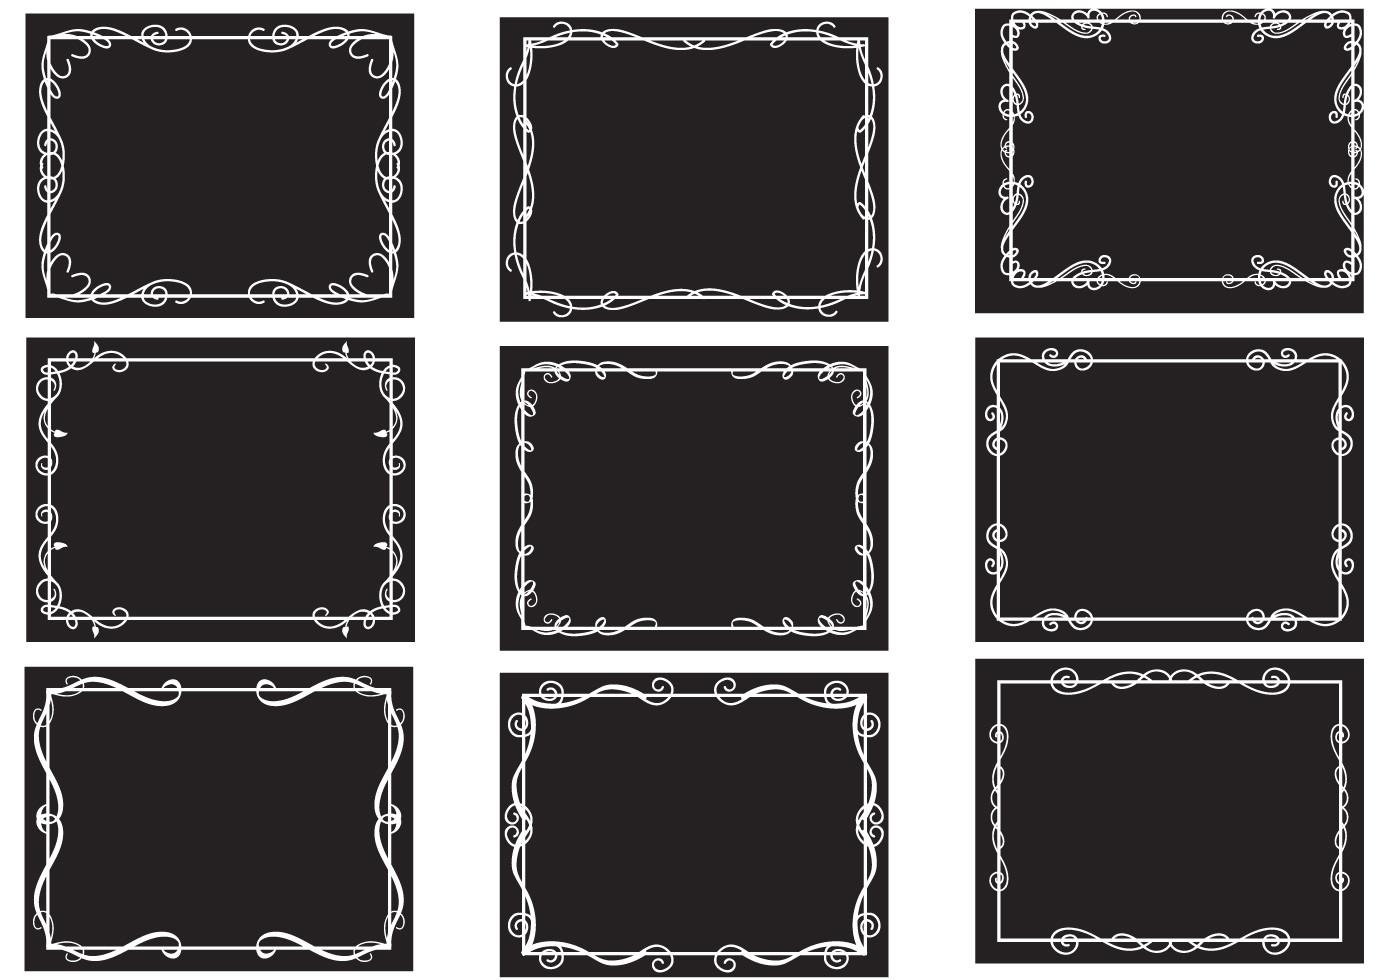 free silent film border vectors jpg